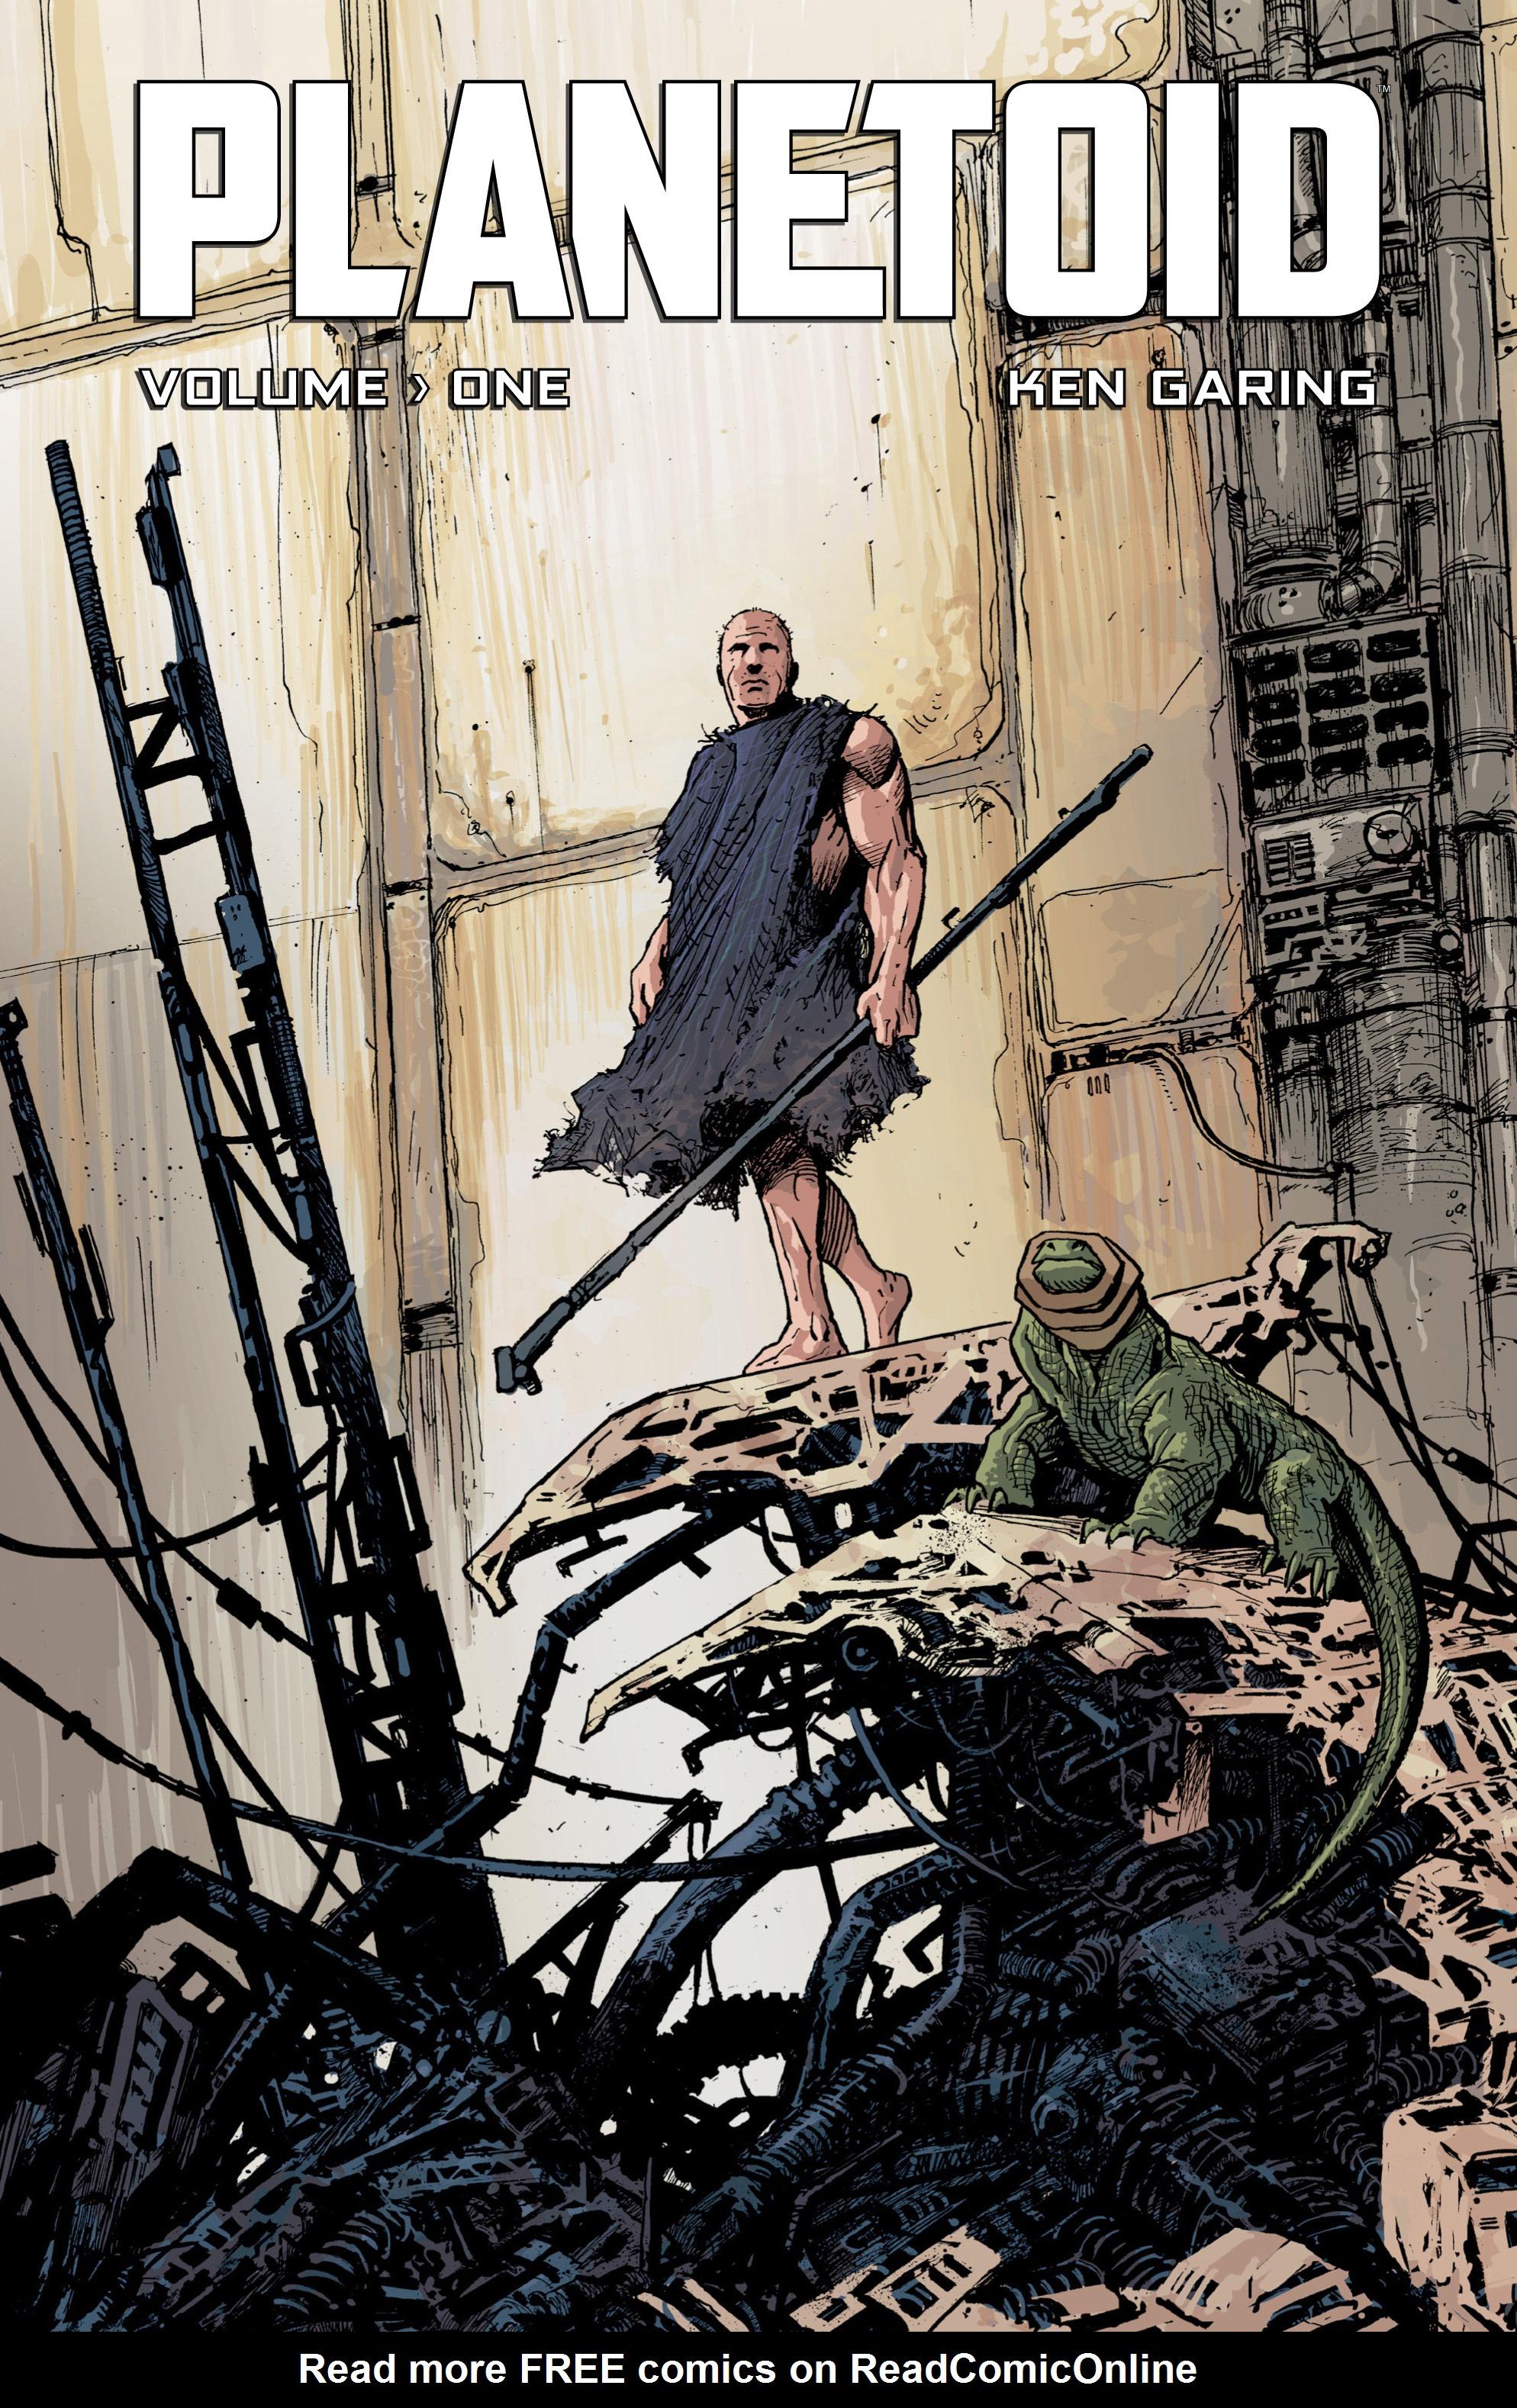 Read online Planetoid comic -  Issue # TPB - 1